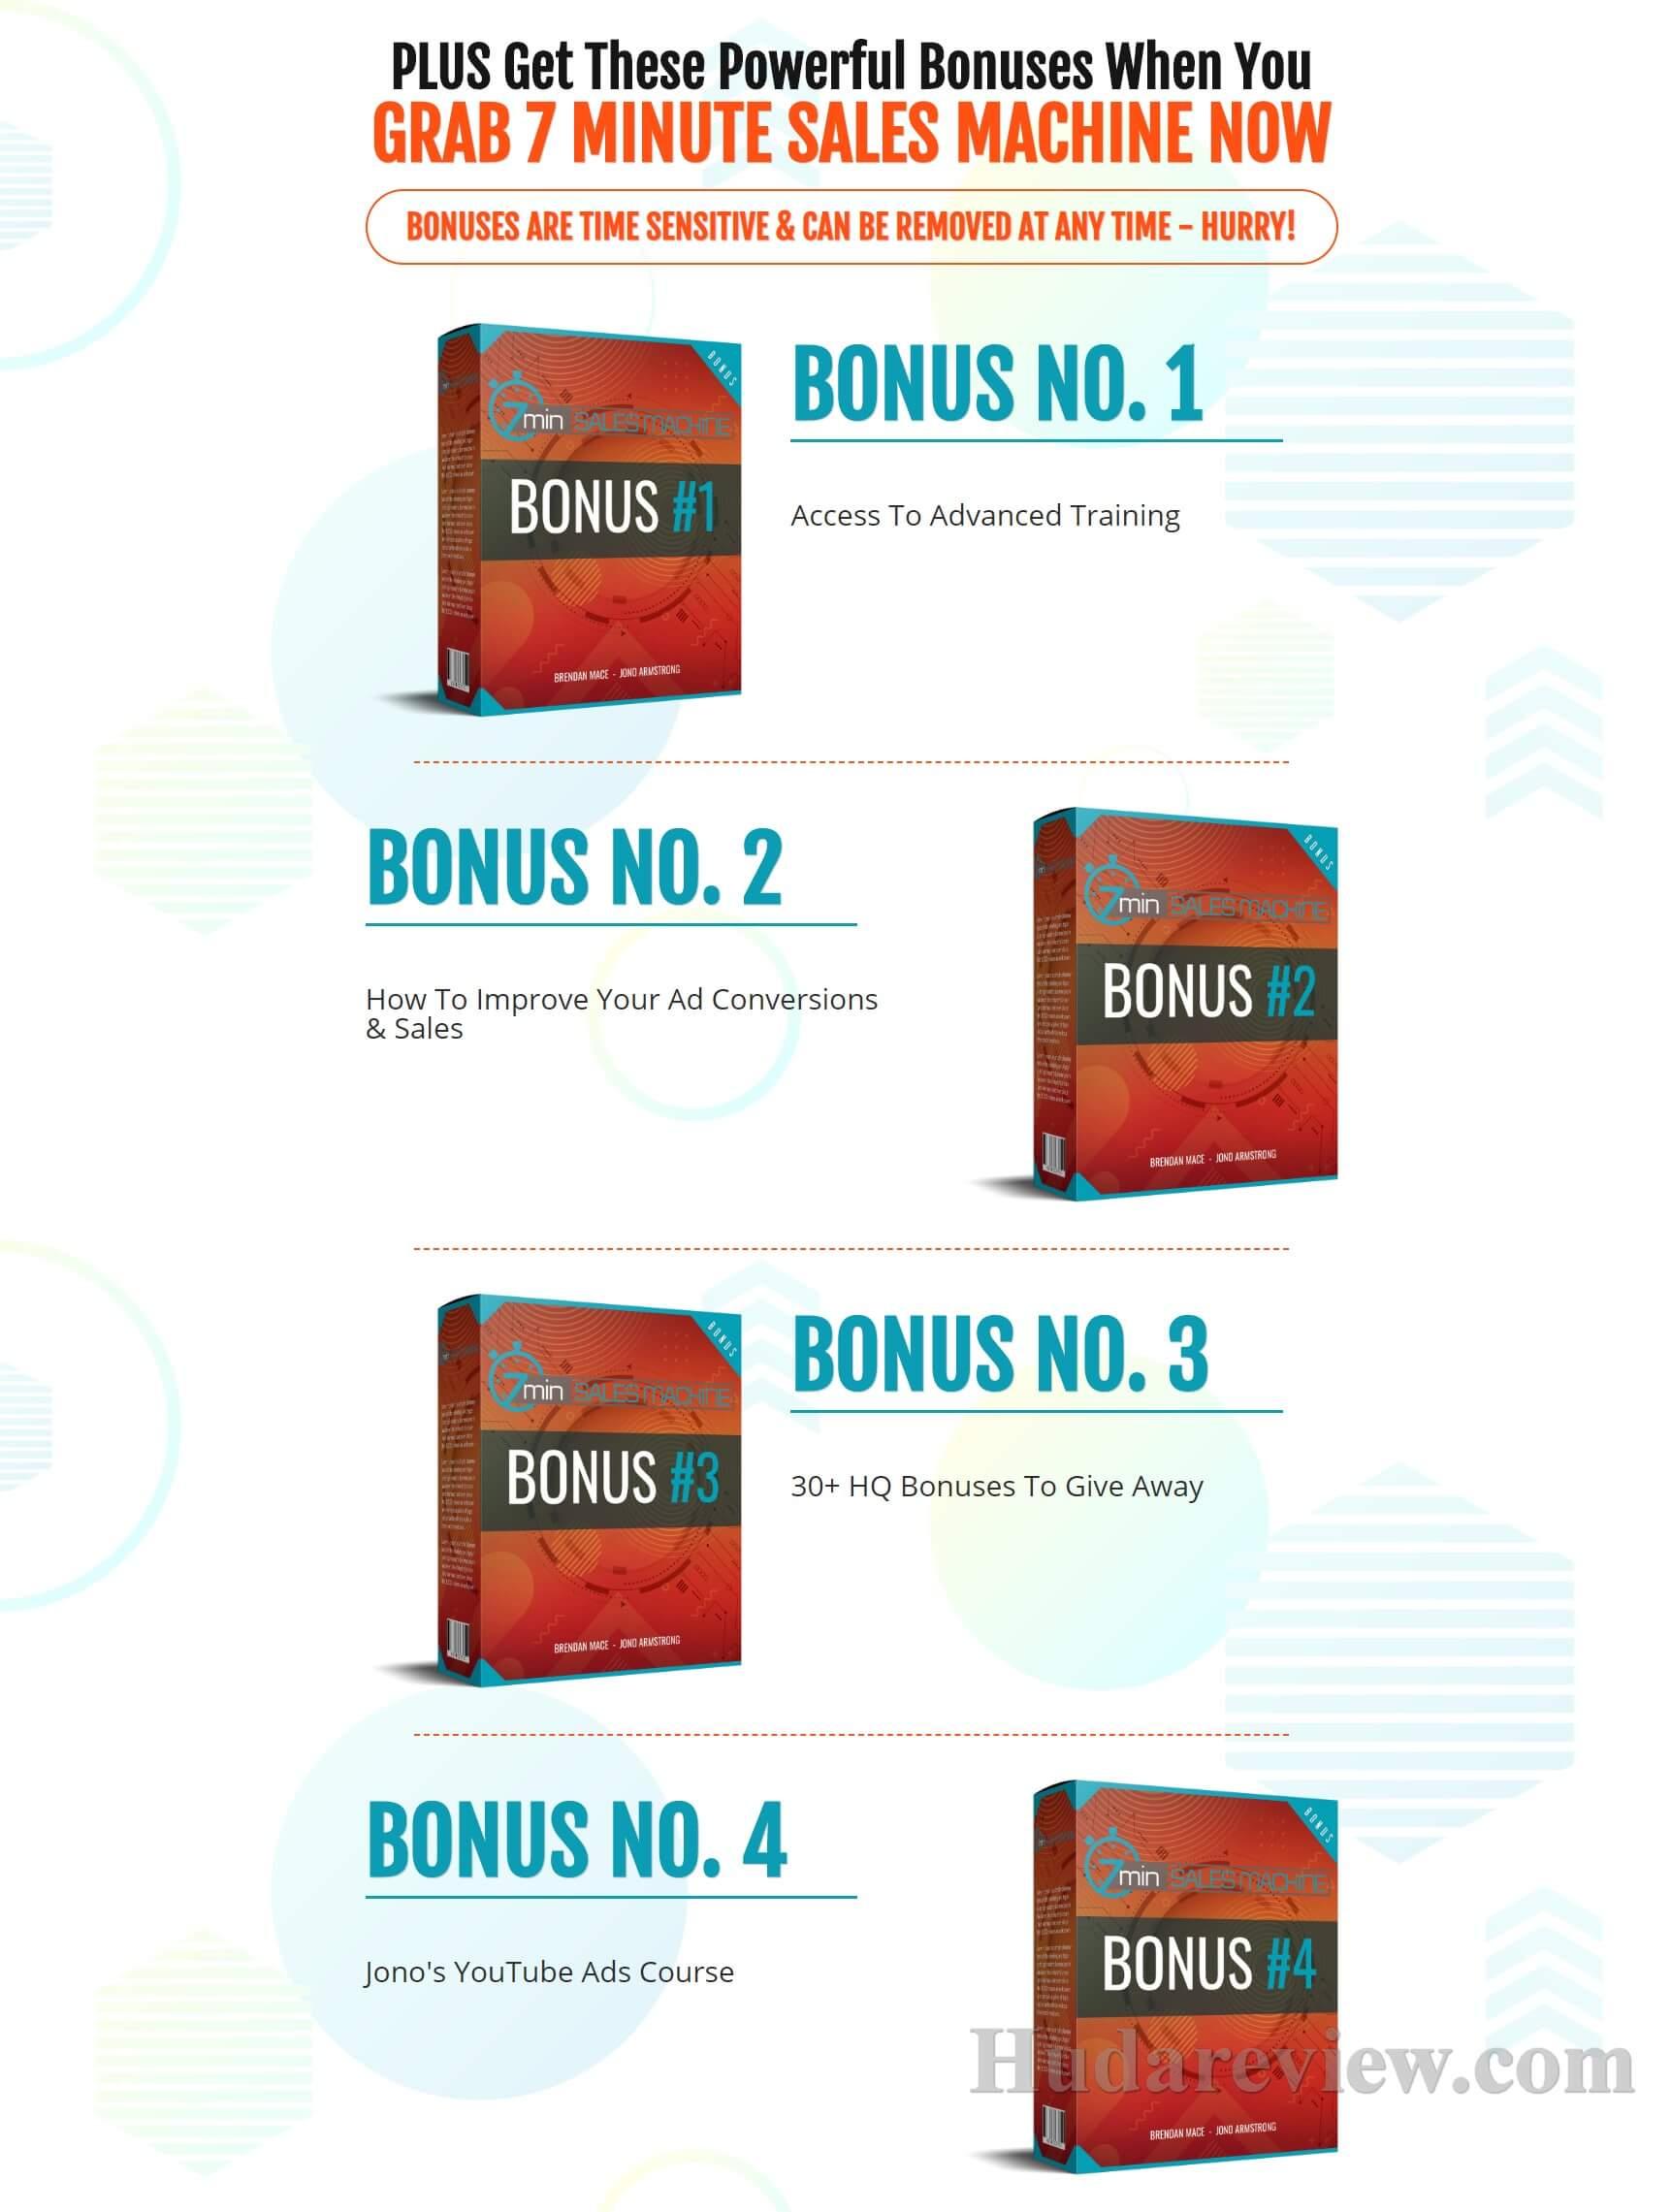 7Min-Sales-Machine-Review-Bonuses